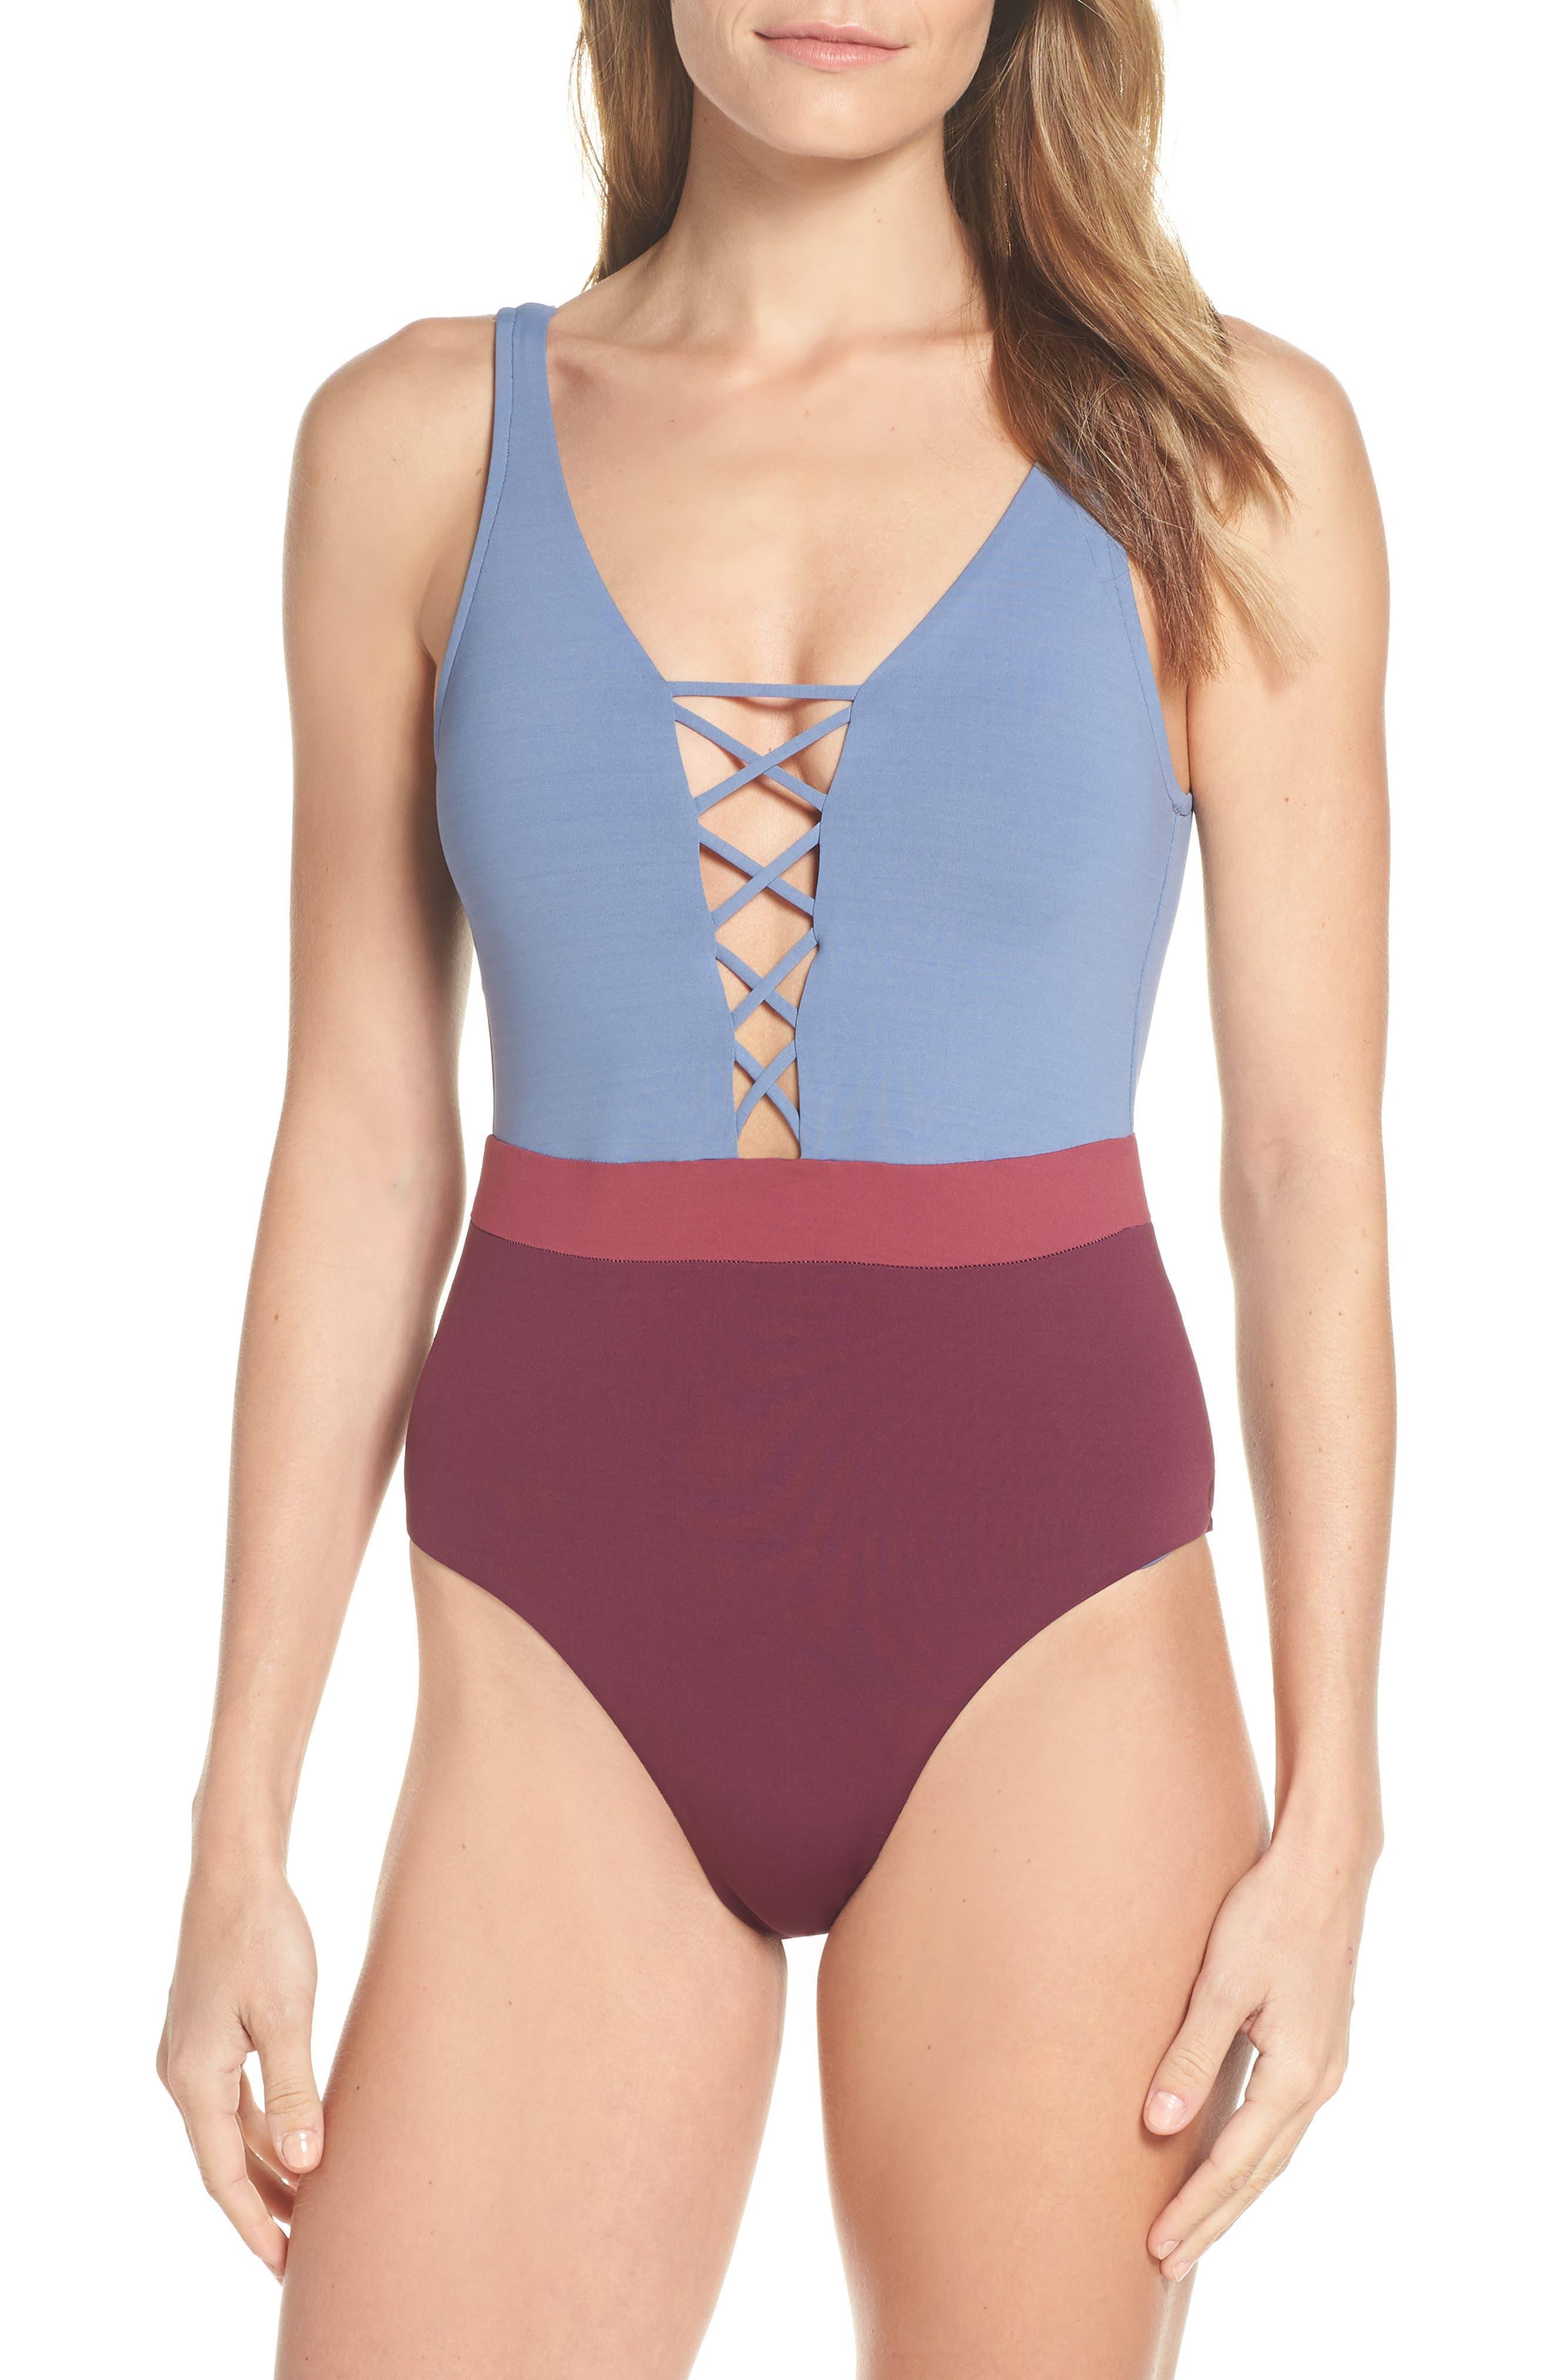 Seafolly Radiance One-Piece Swimsuit, US / 16 AU - Grey